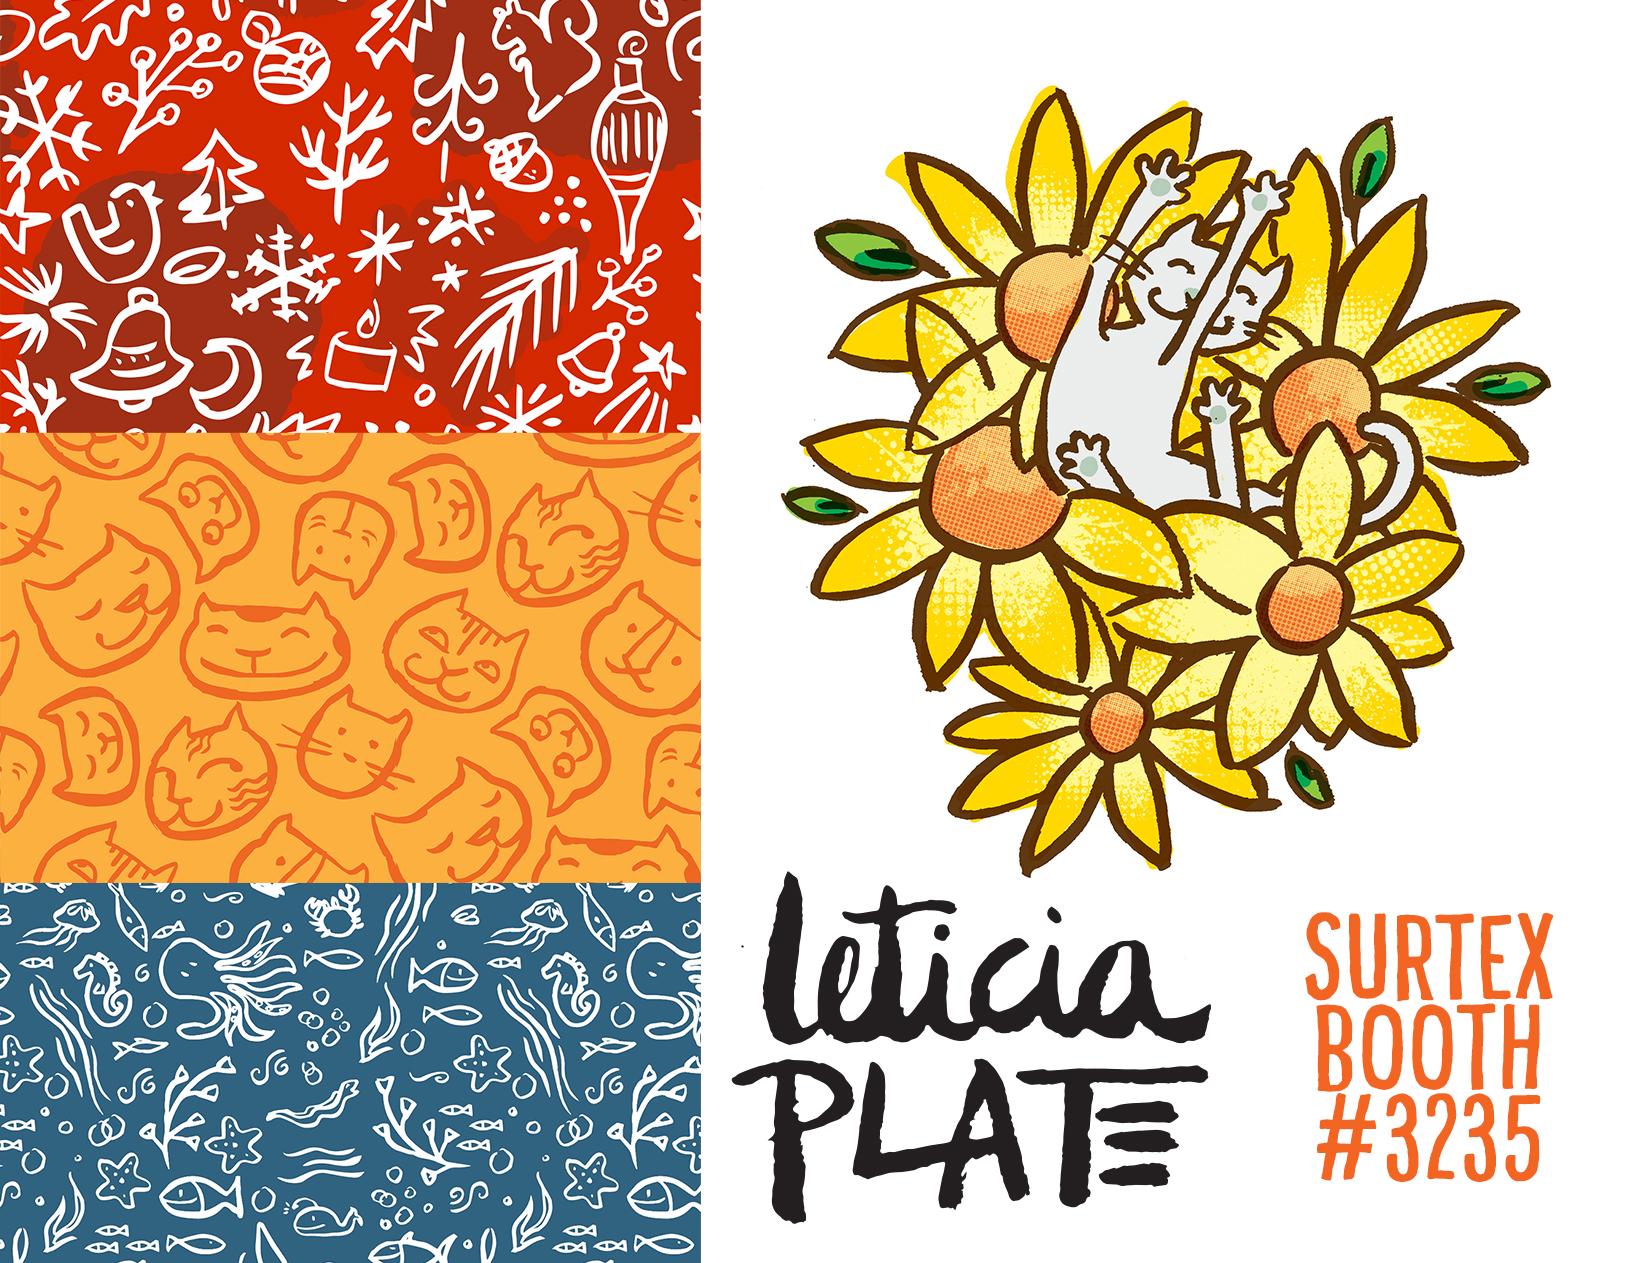 Leticia Plate Leticard-Surtex.jpg